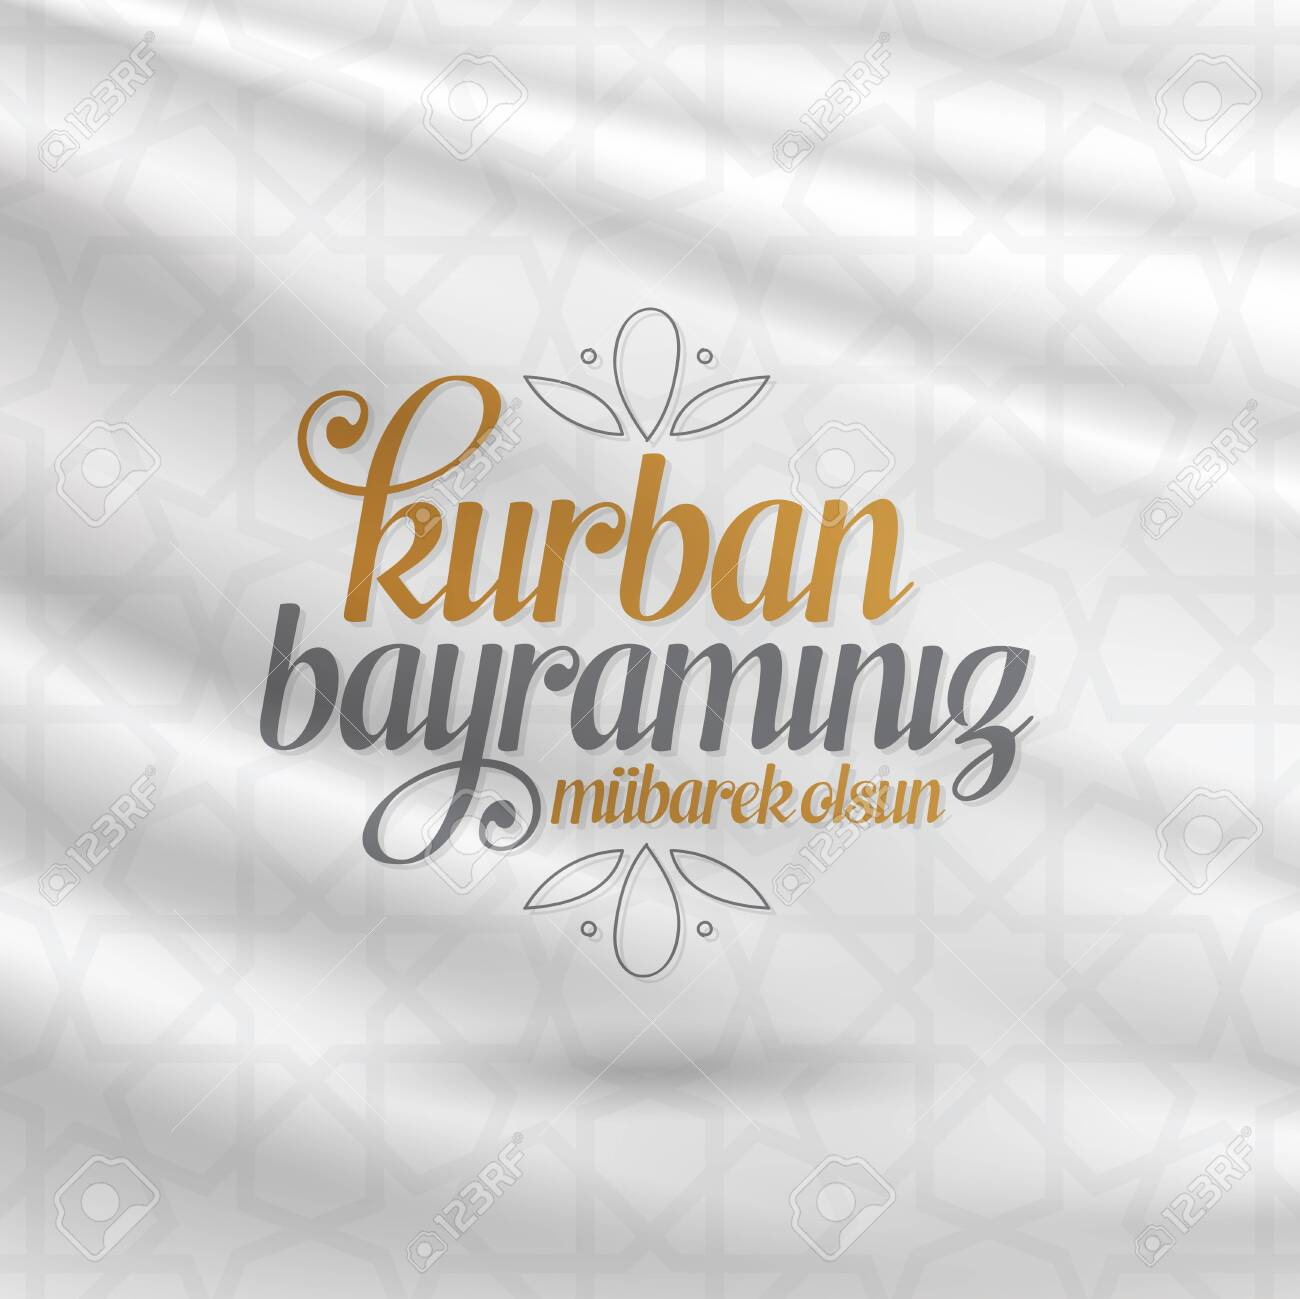 Feast of the Sacrif (Eid al-Adha Mubarak) Holy days of muslim community. Billboard, Poster, Social Media, Greeting Card template. - 126051030